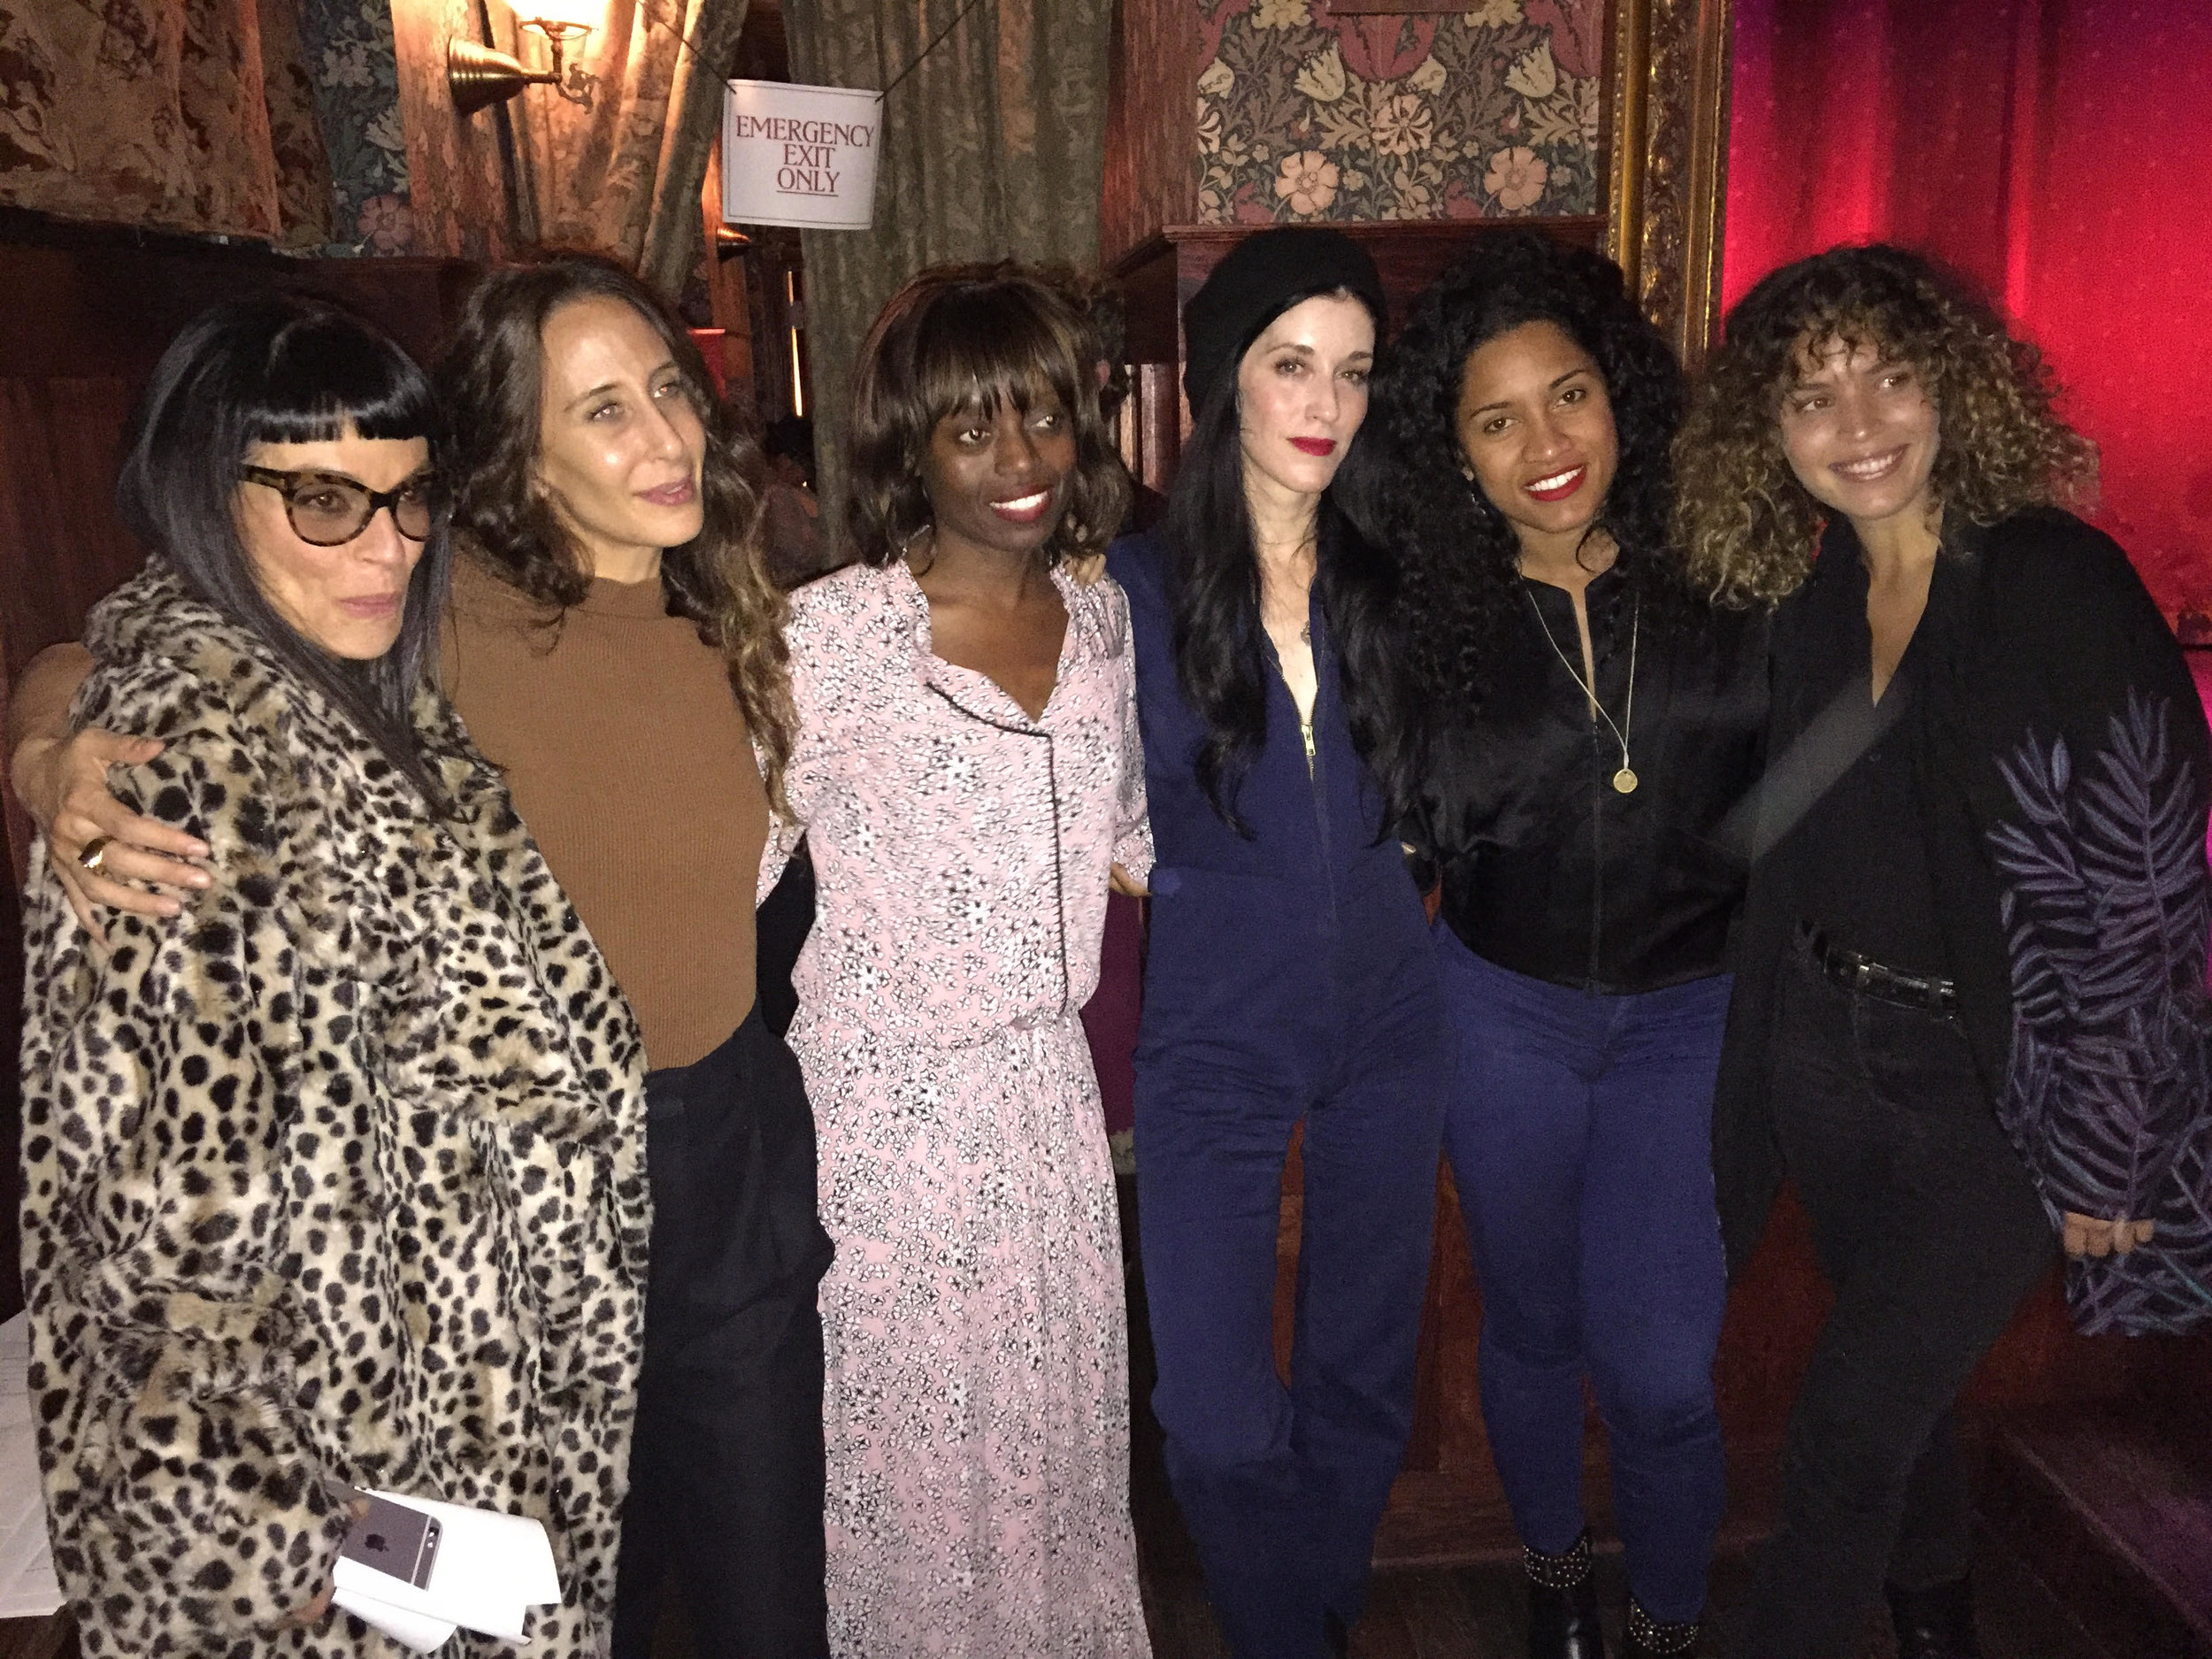 Amazing women from the Town Hall event. Left to Right:  Norma Kamali, Mara Hoffman, Dee Poku, Sarah Sophie Flicker, De'Ara Balenger, Cleo Wade